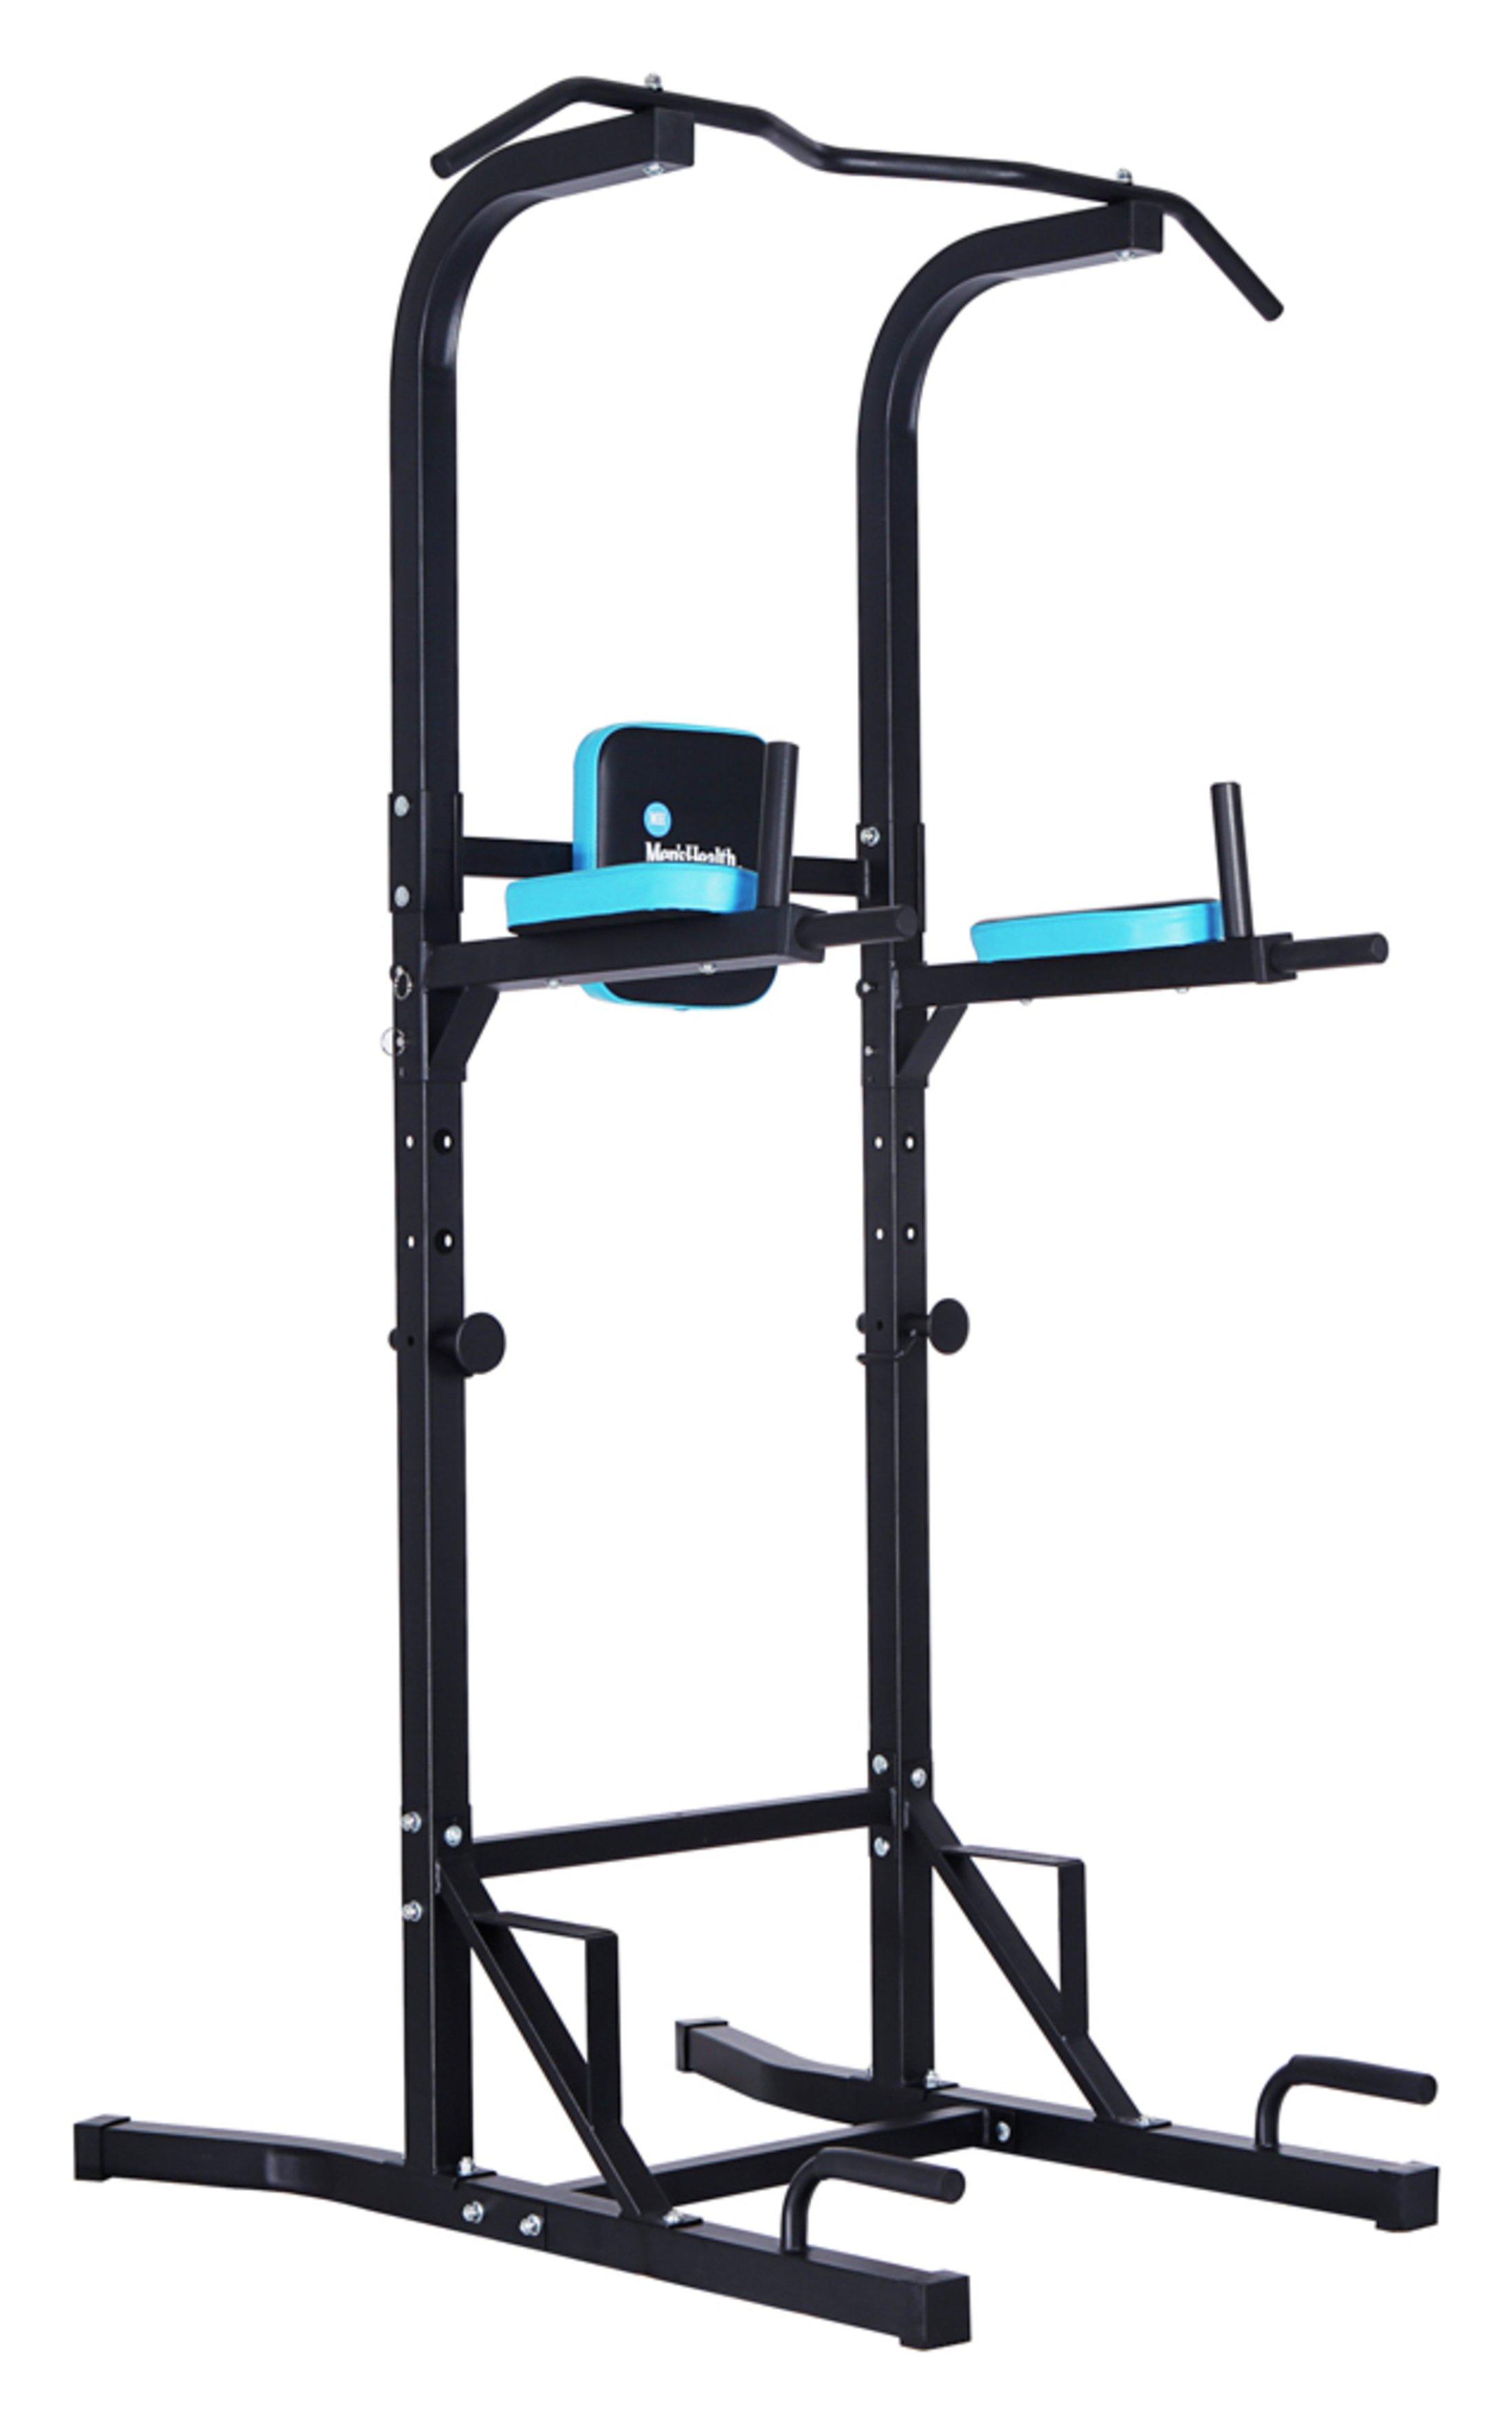 chair gym argos armless upholstered slipcover buy men s health power tower multi gyms